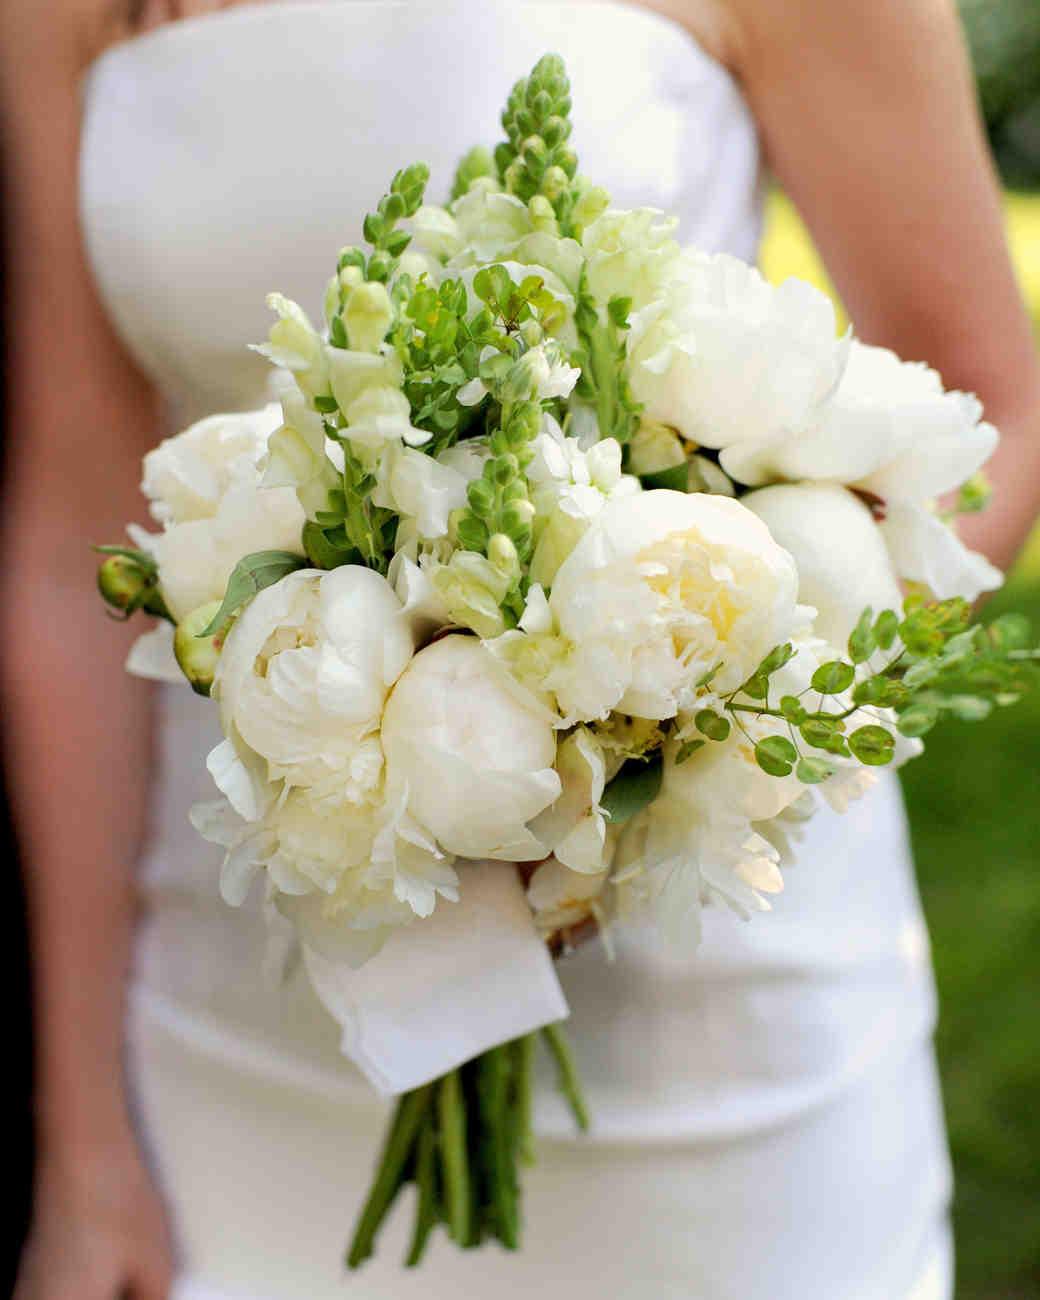 top-wedding-florists-sidra-forman-chris-holly-sp11-0215.jpg